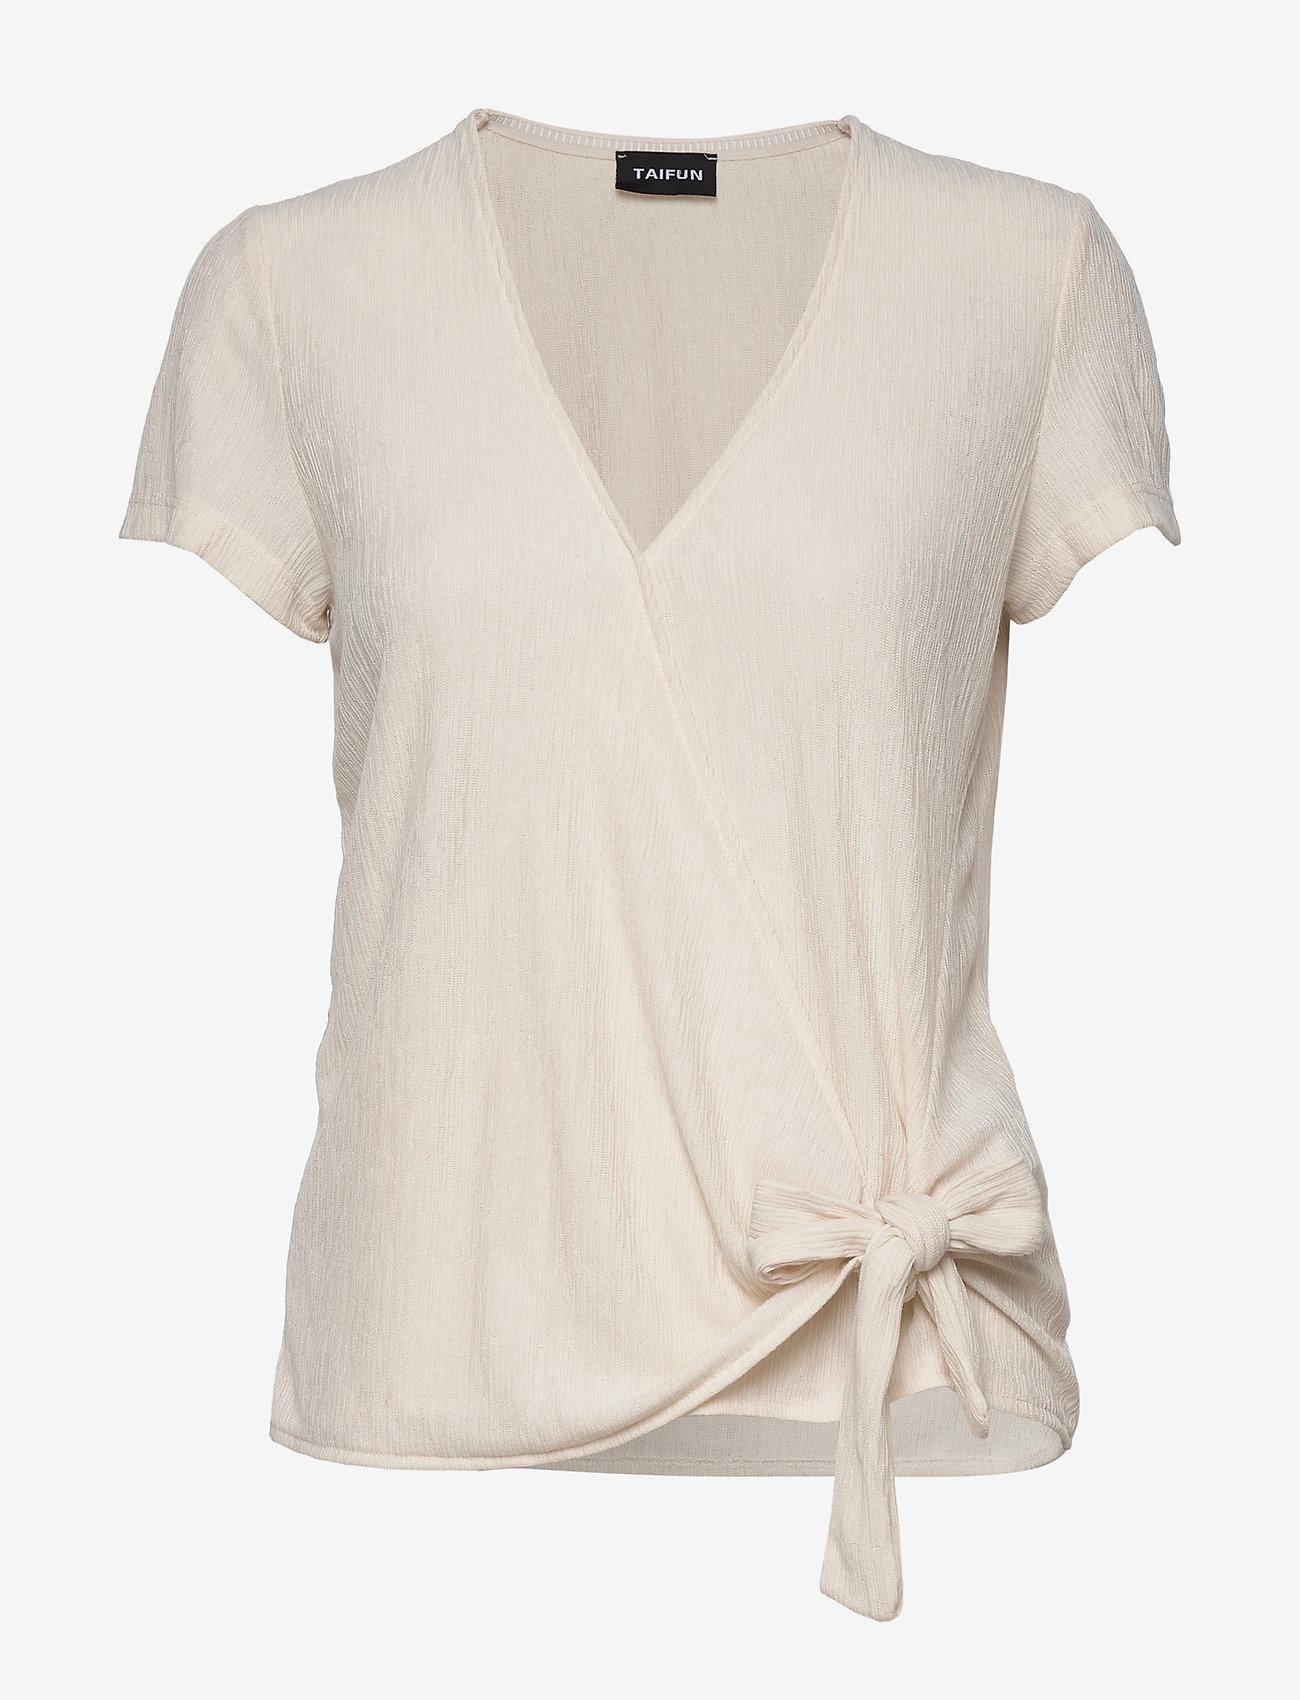 Taifun - T-SHIRT SHORT-SLEEVE - t-shirts - linen - 0